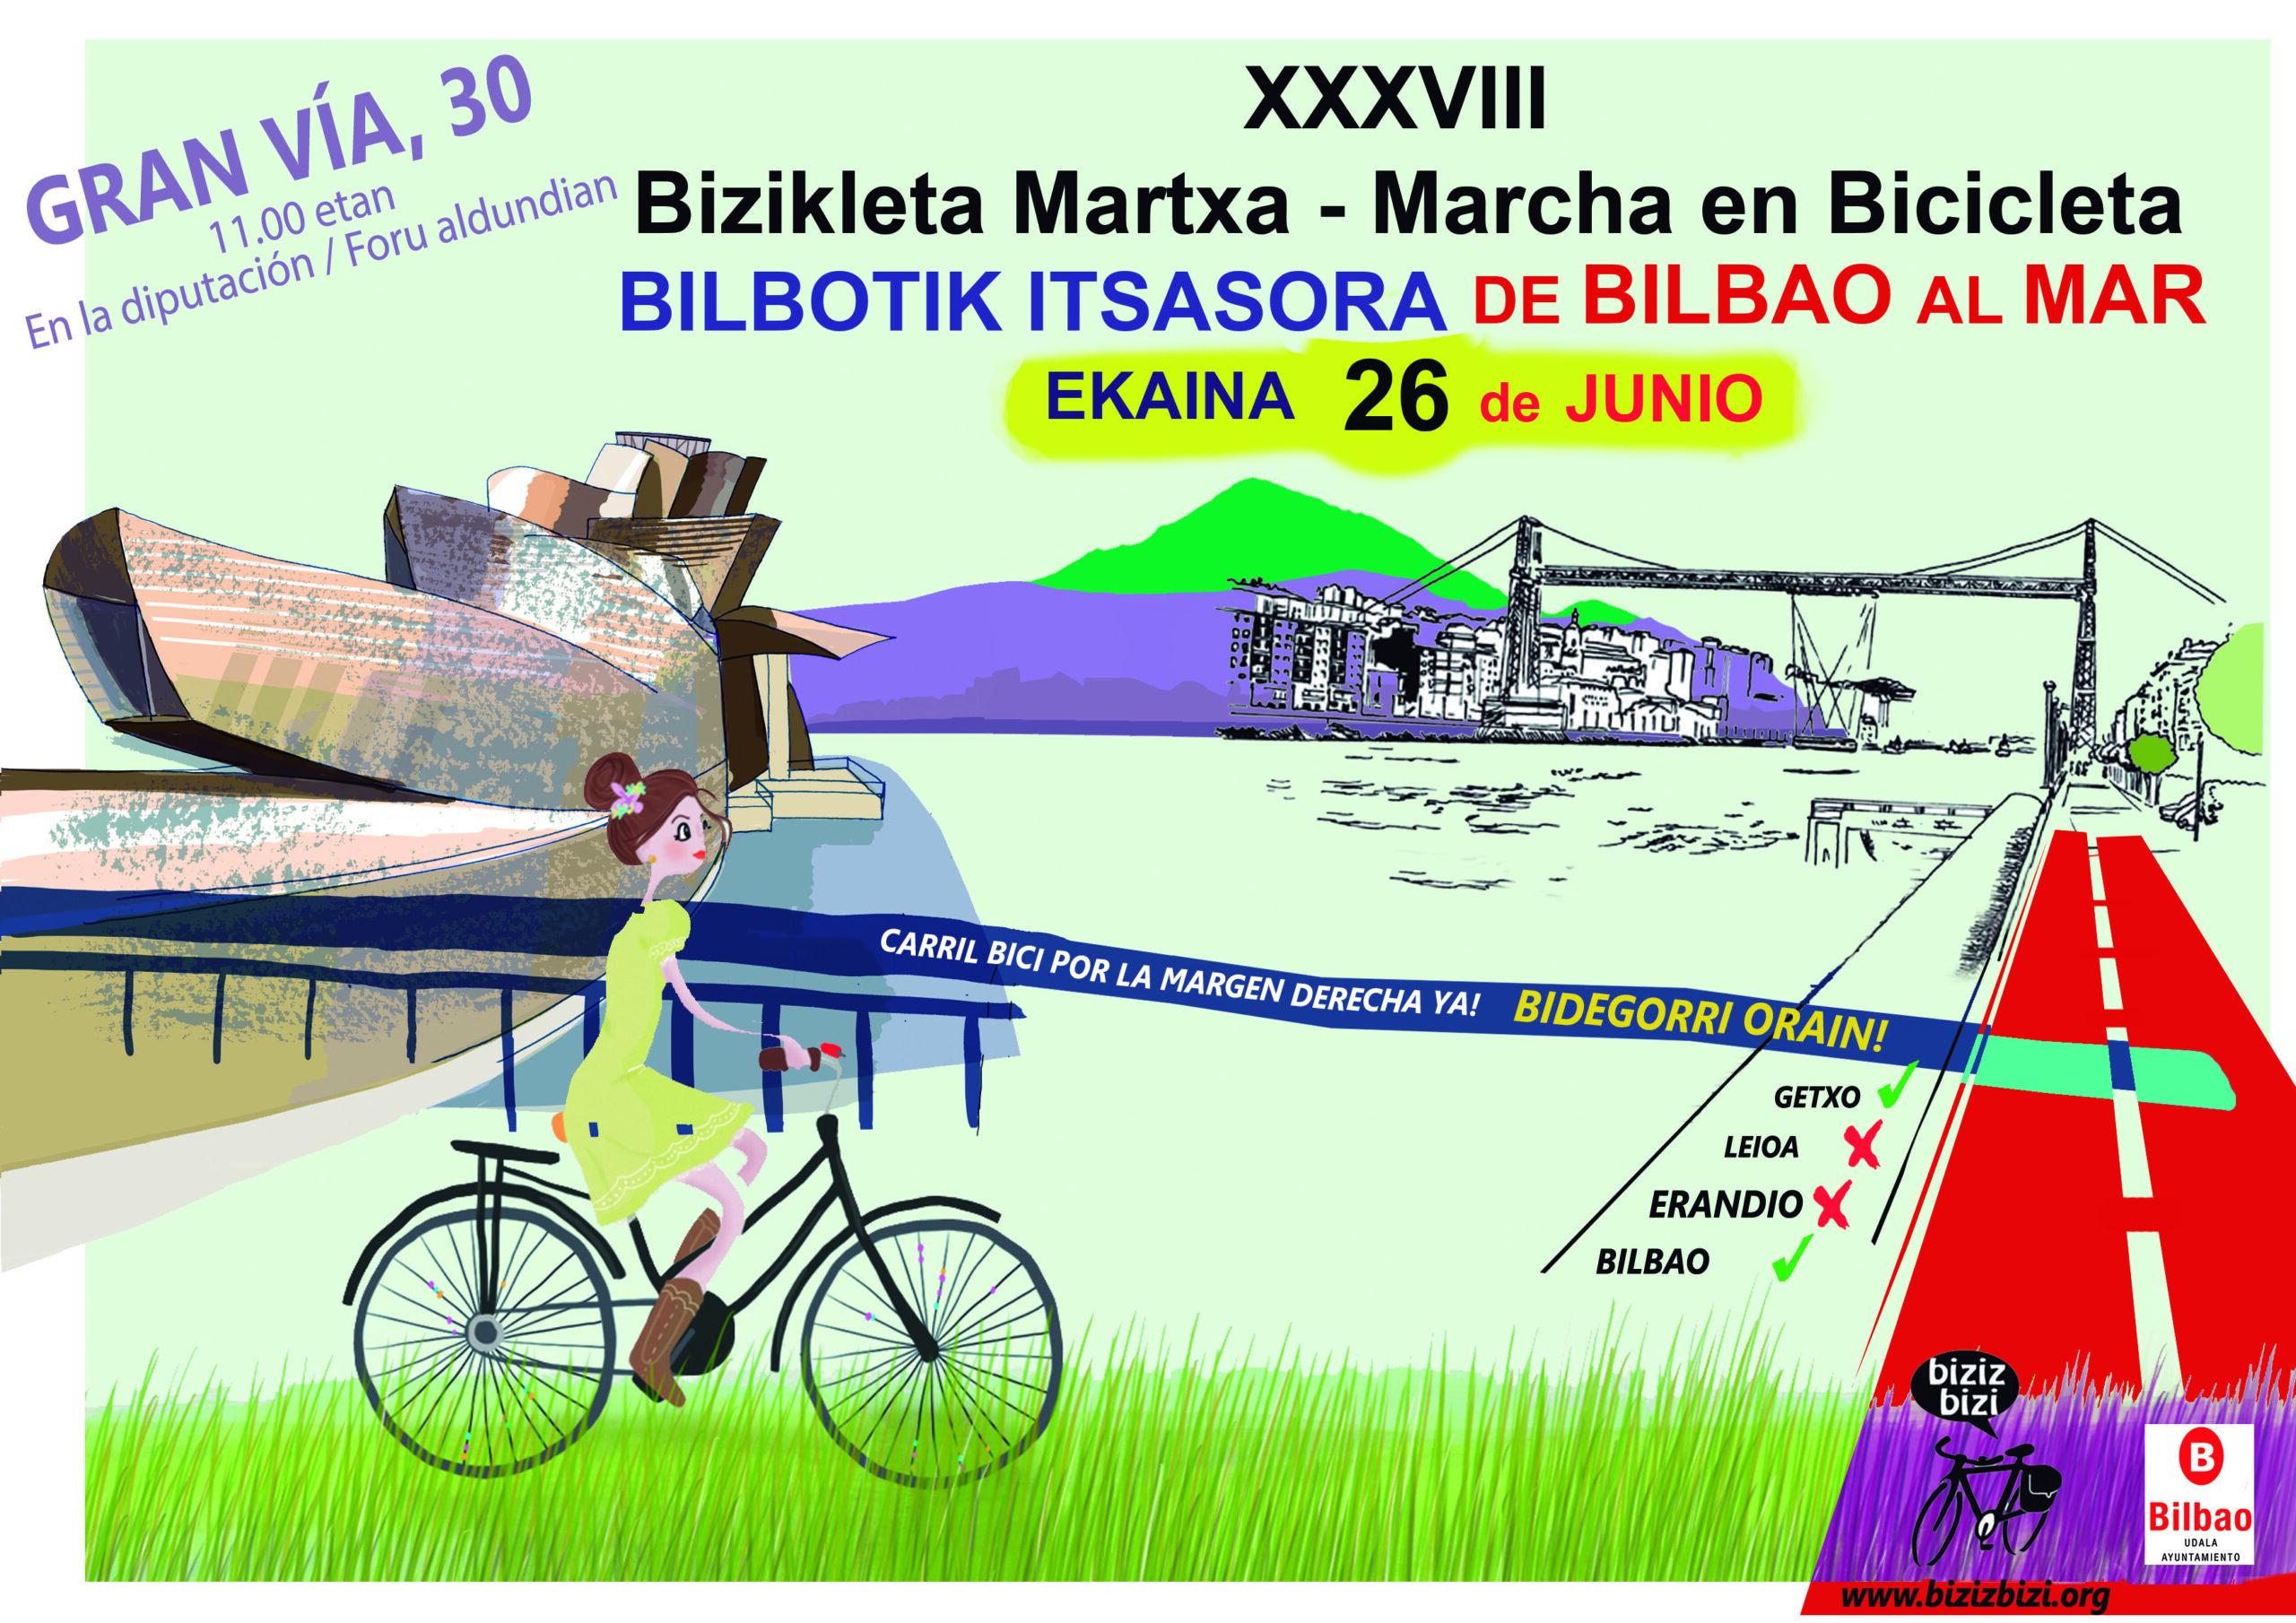 XXXVIII Bicimarcha #BilbotikItxasora